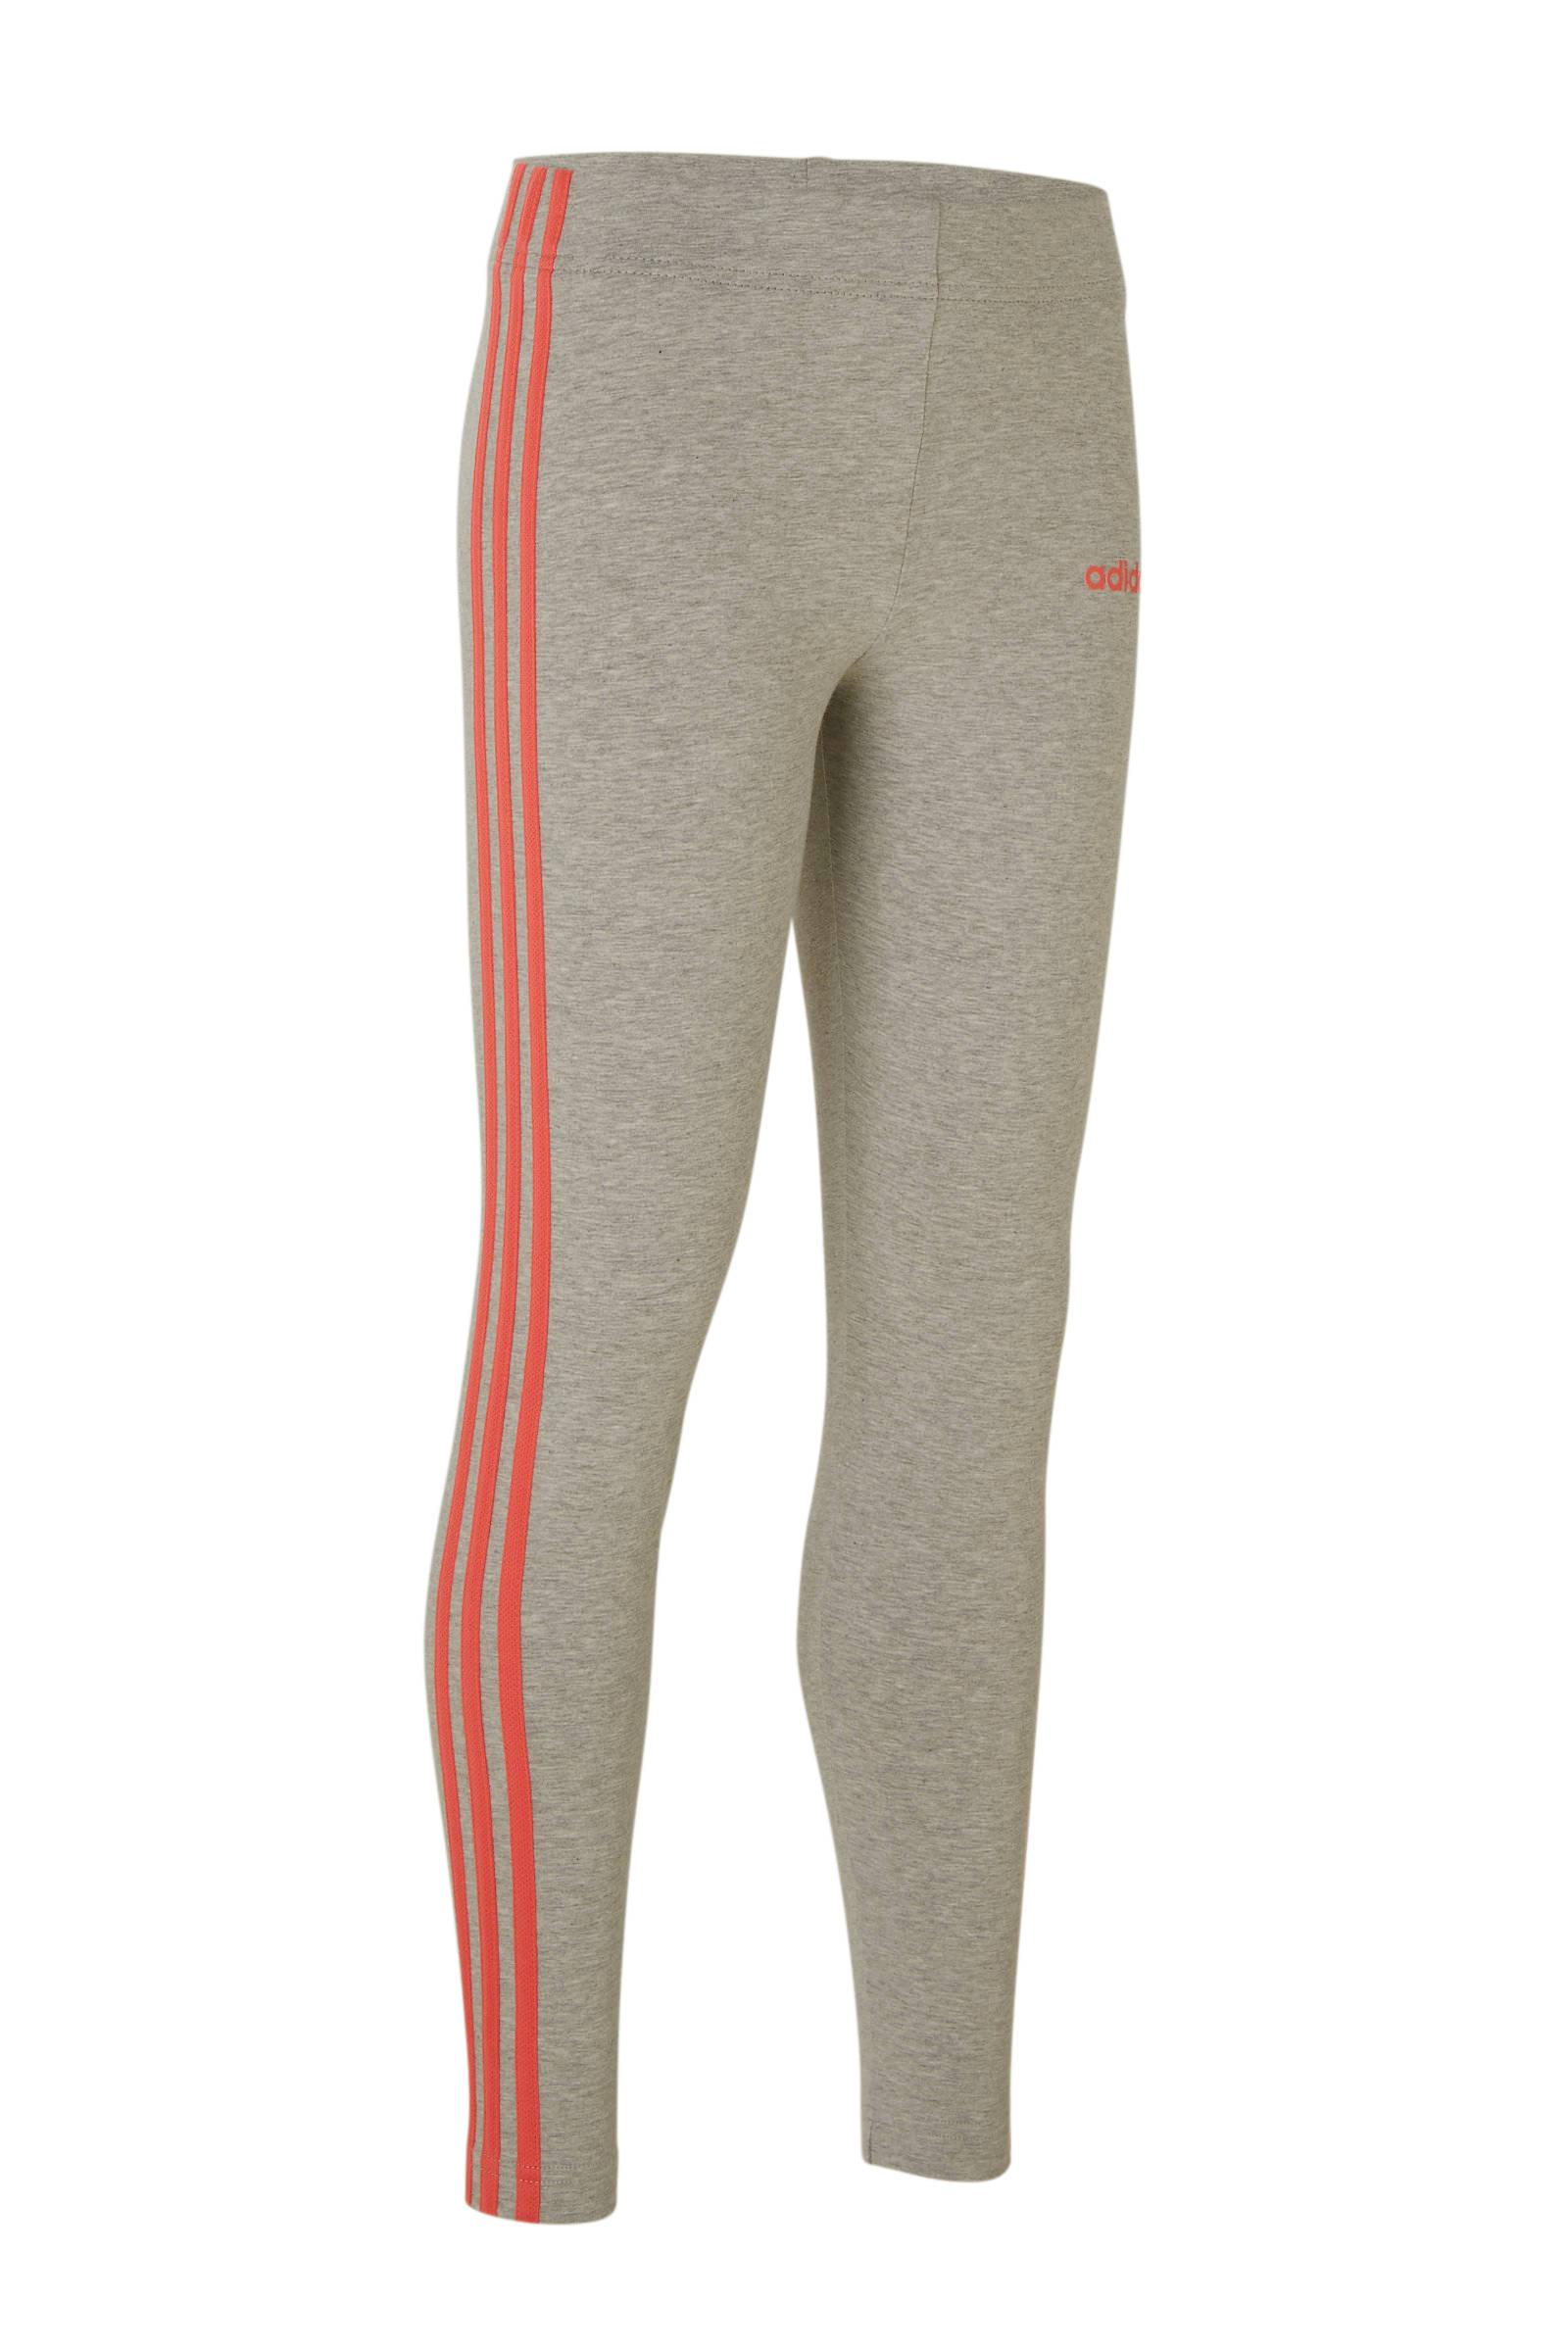 adidas performance sportbroek grijsroze | wehkamp